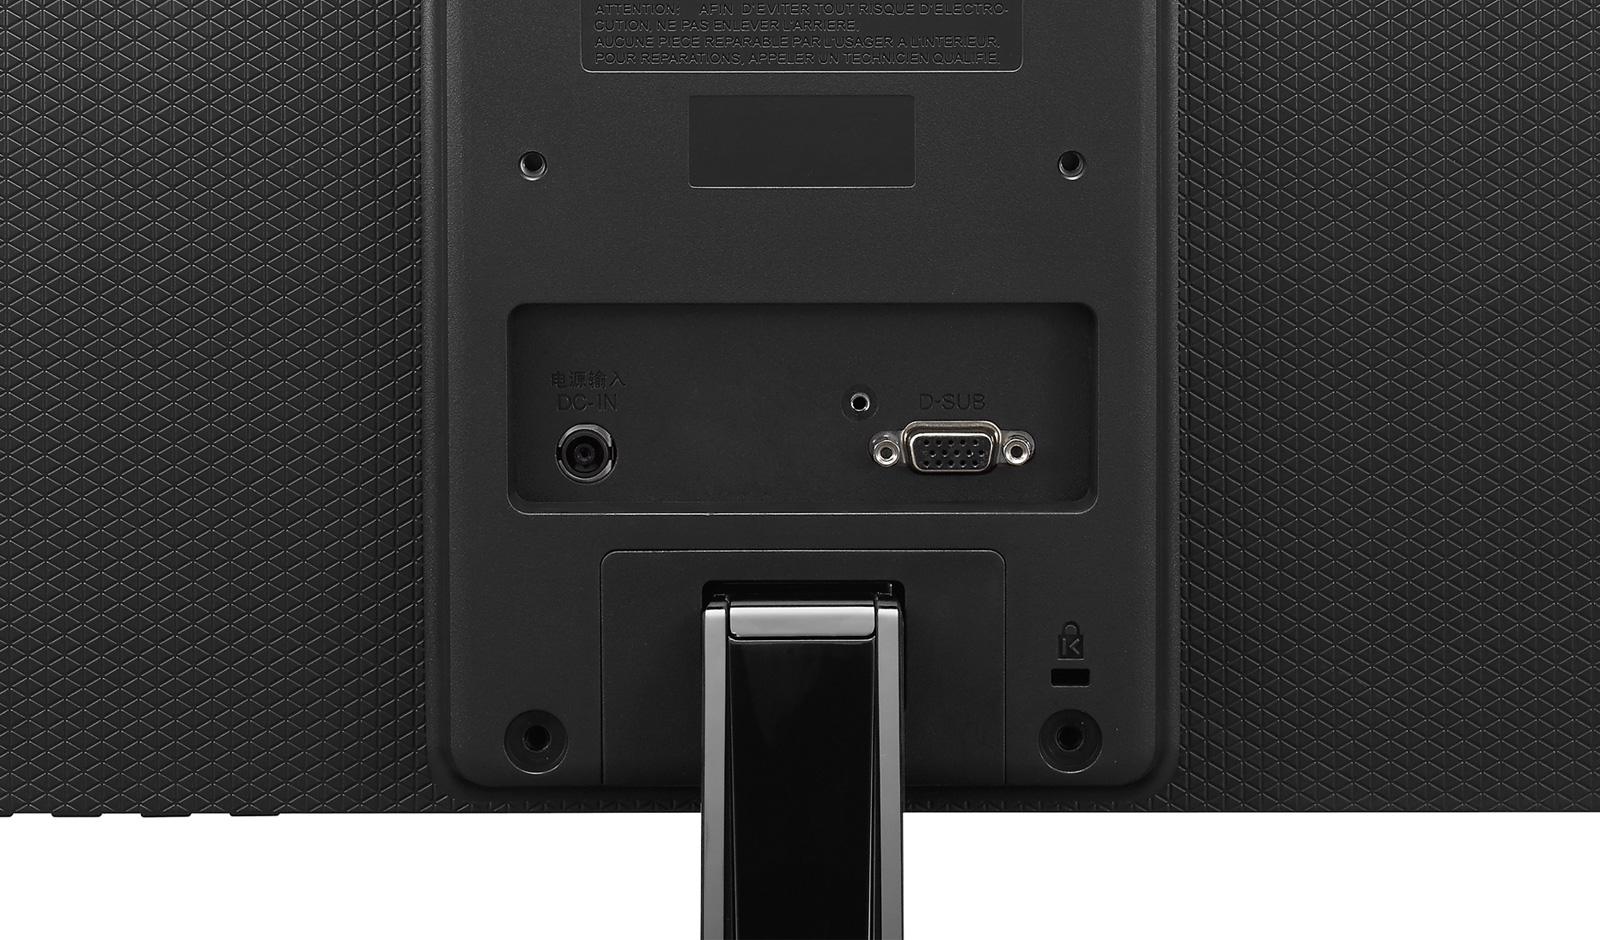 "LG 22M38A-B 21.5"" 5ms (Analog) Led Monitör resim & okuyucu modu bulunur,panel tipi: tn"